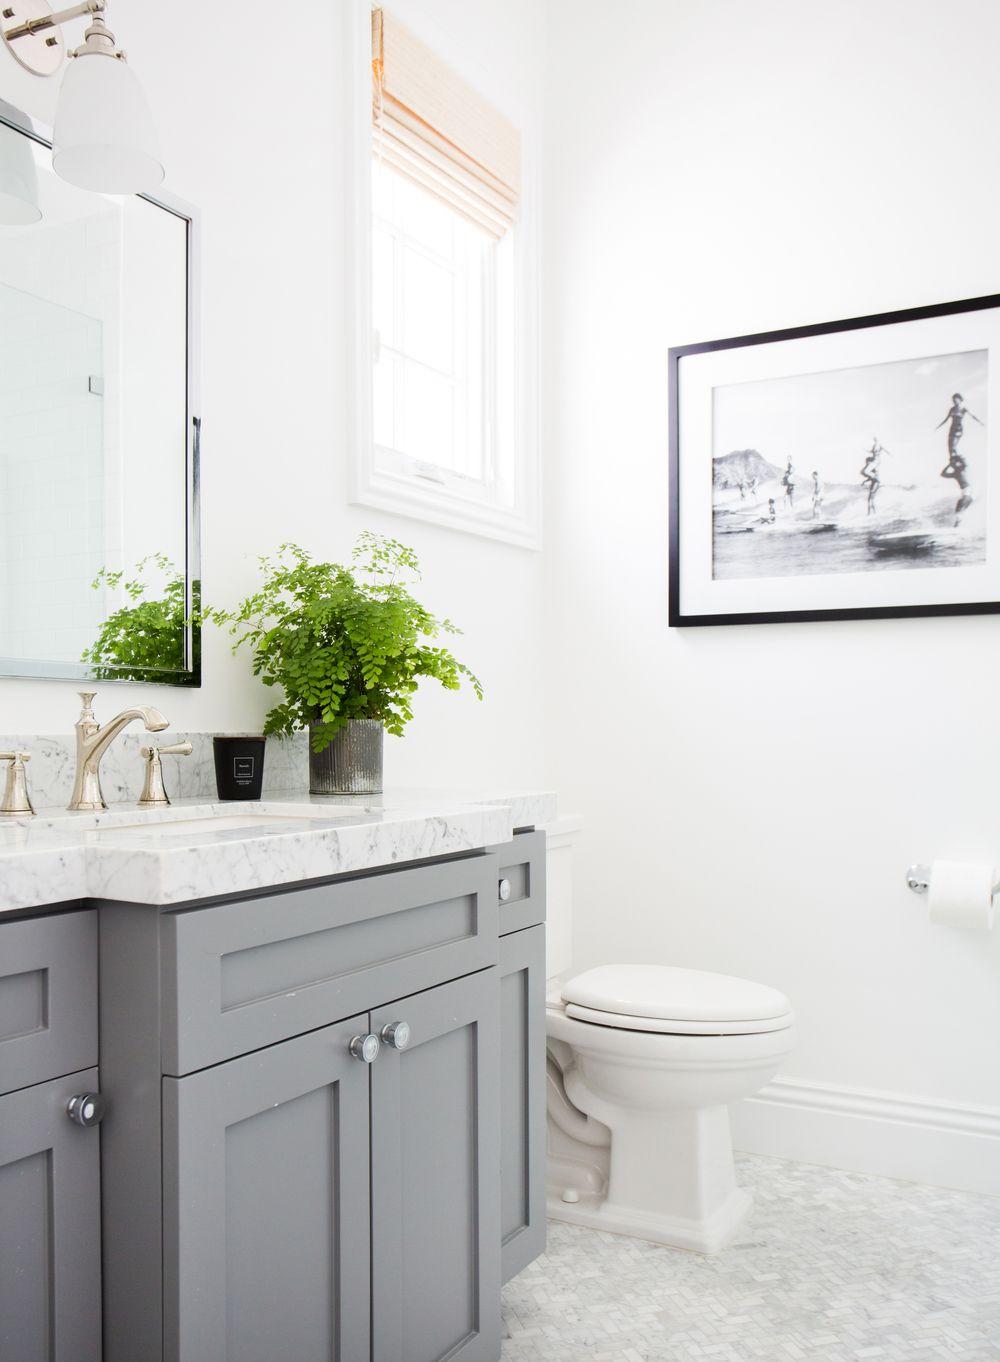 Bathroom With Benjamin Moore Chelsea Gray Vanity And B W Artwork